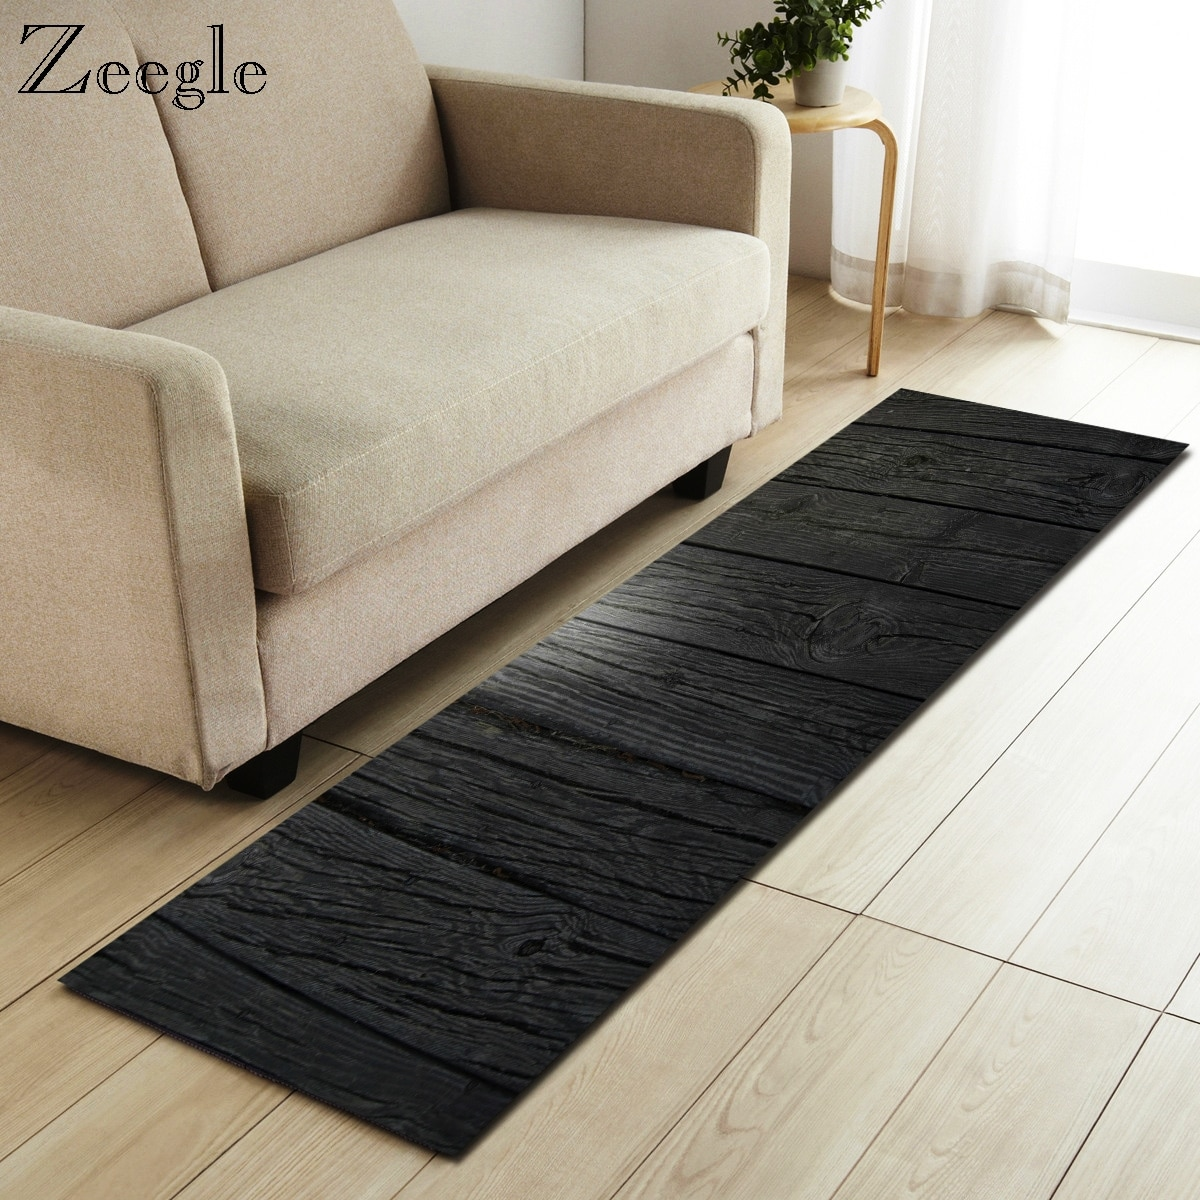 Zeegle Wood Pattern Carpet Rectangle Carpet For Living Room Area Rug Anti-slip Bedroom Mats Kitchen Carpet Sofa Table Floor Mats